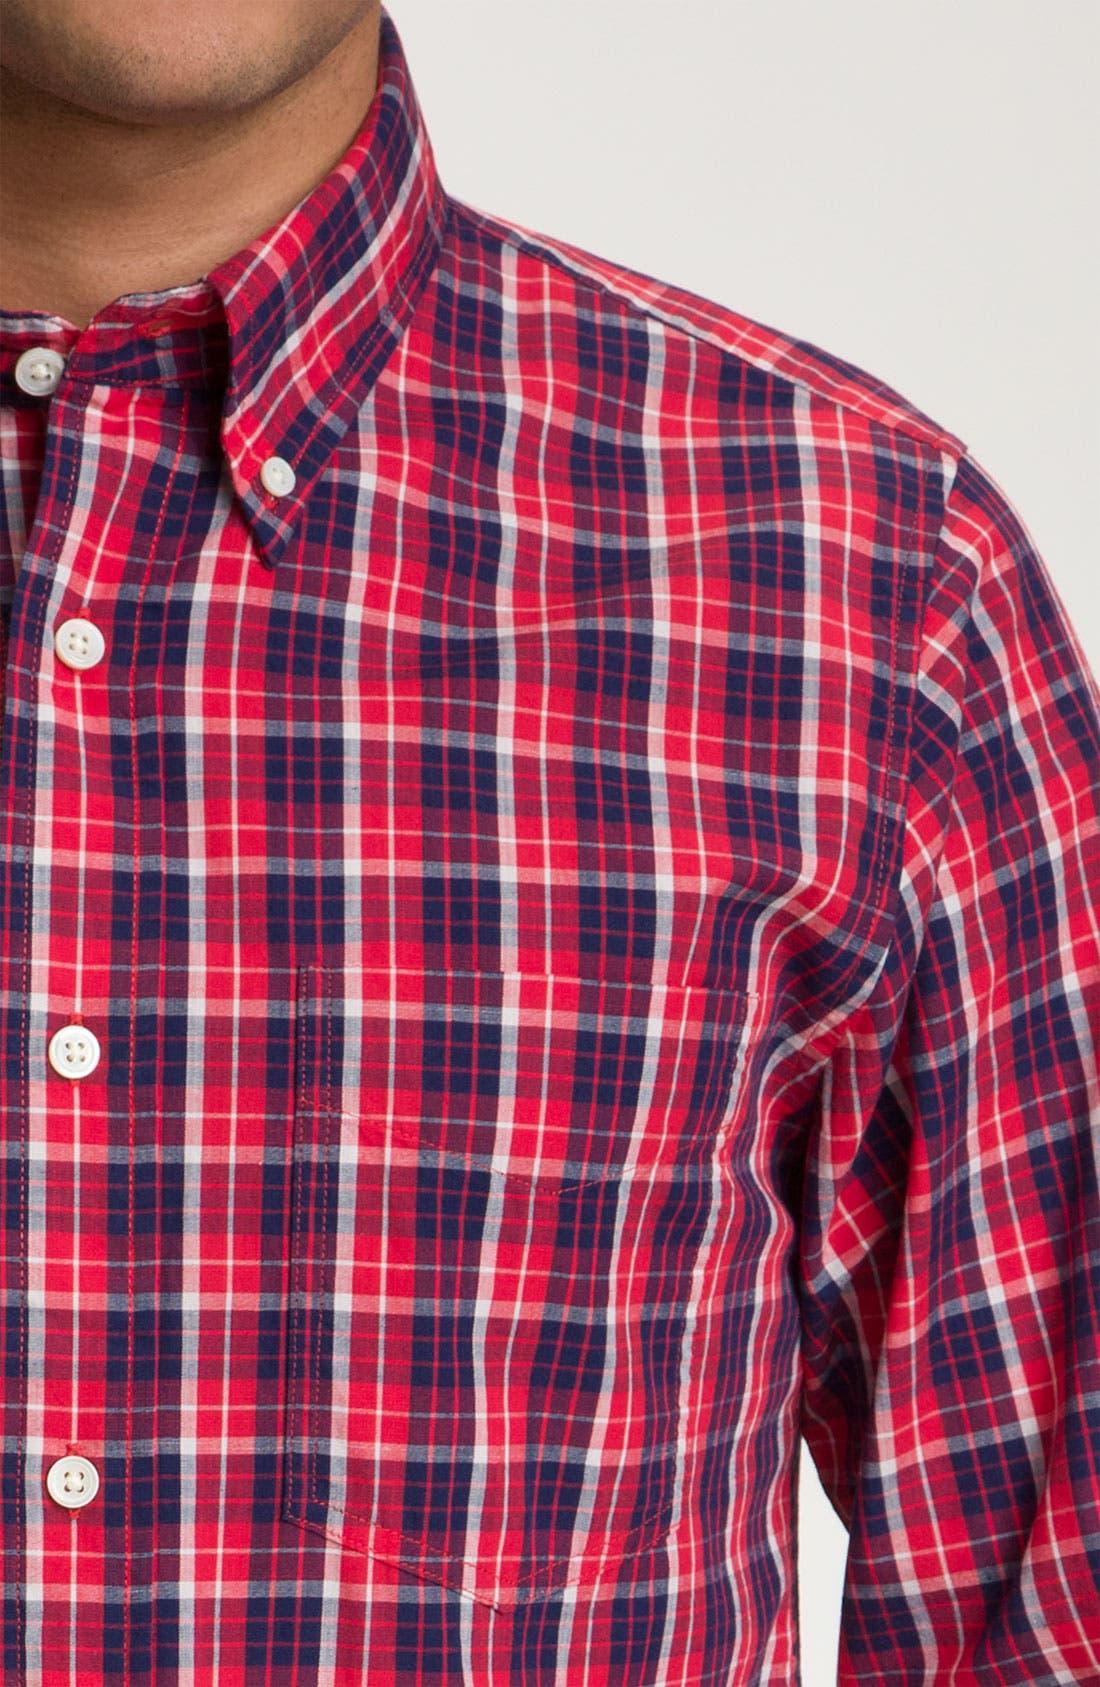 Alternate Image 3  - Jack Spade 'Adler' Plaid Woven Shirt